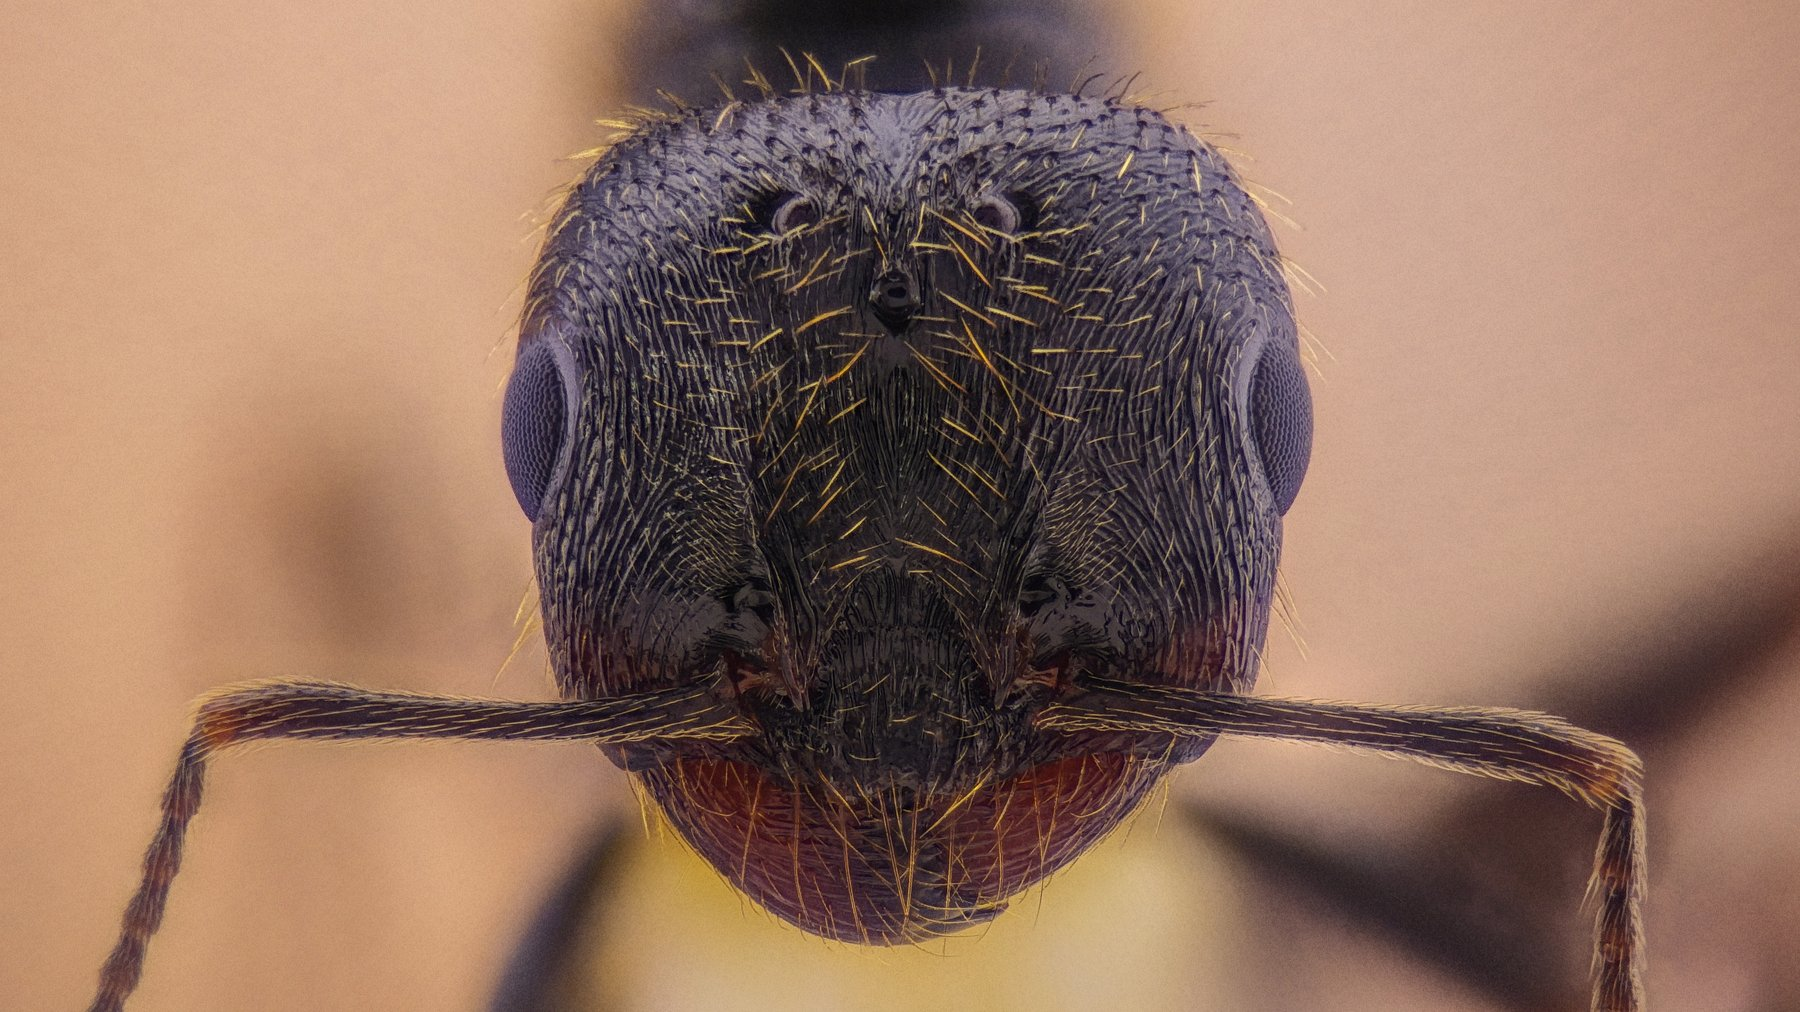 ceclii,macro,lgg4, extremmacro, муравей, мравка, Цветан Ганев